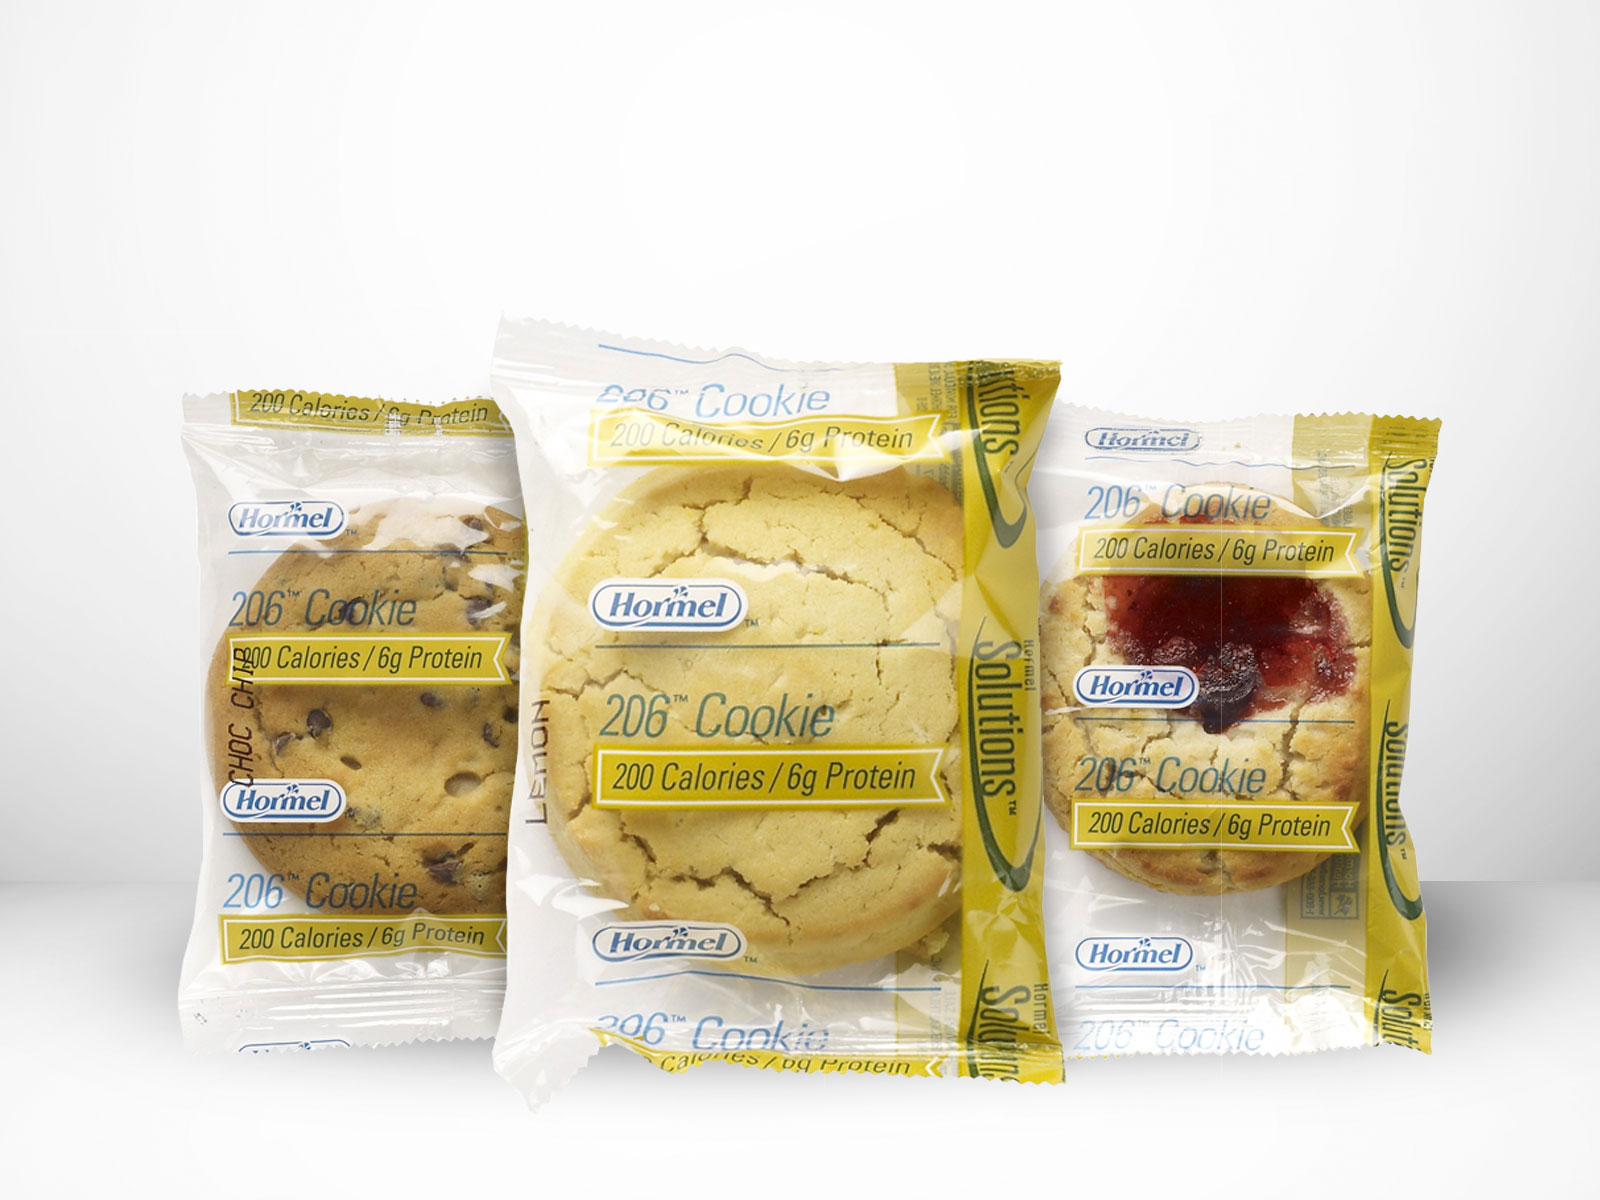 Hormel Vital Cuisine 206 Cookies   Hormel Health Labs 1600x1200